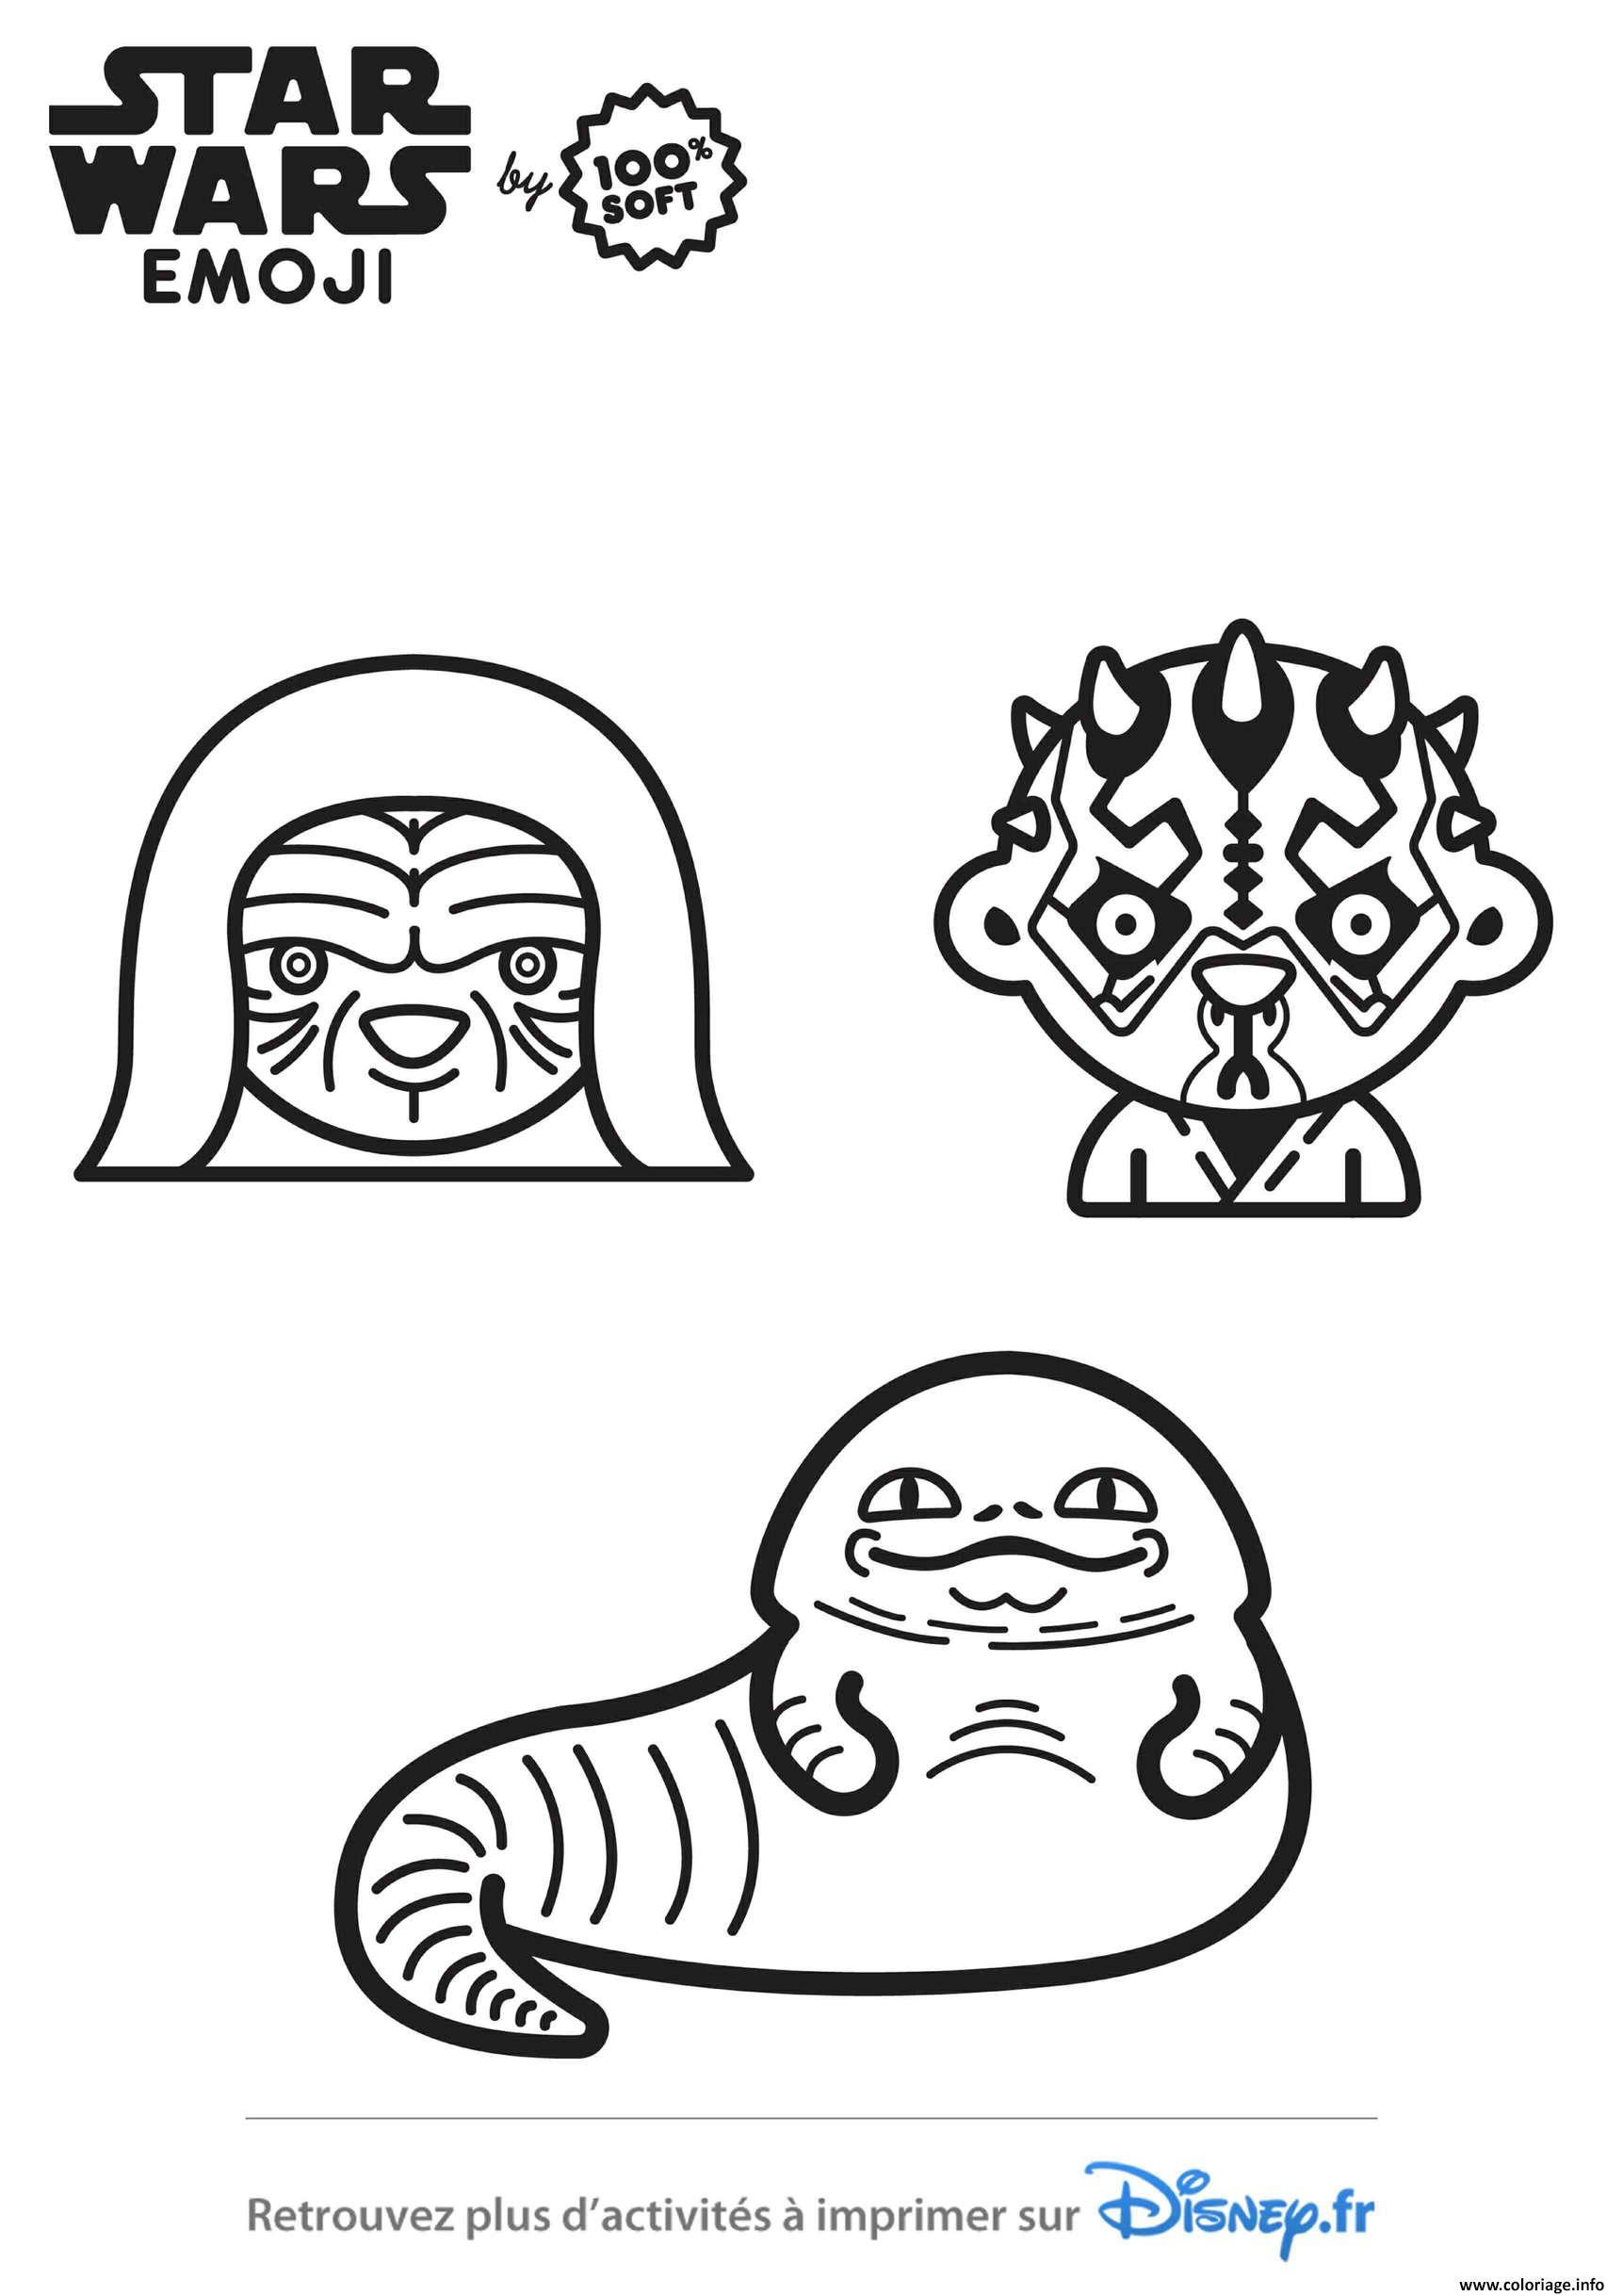 Dessin star wars emoji saga Coloriage Gratuit à Imprimer